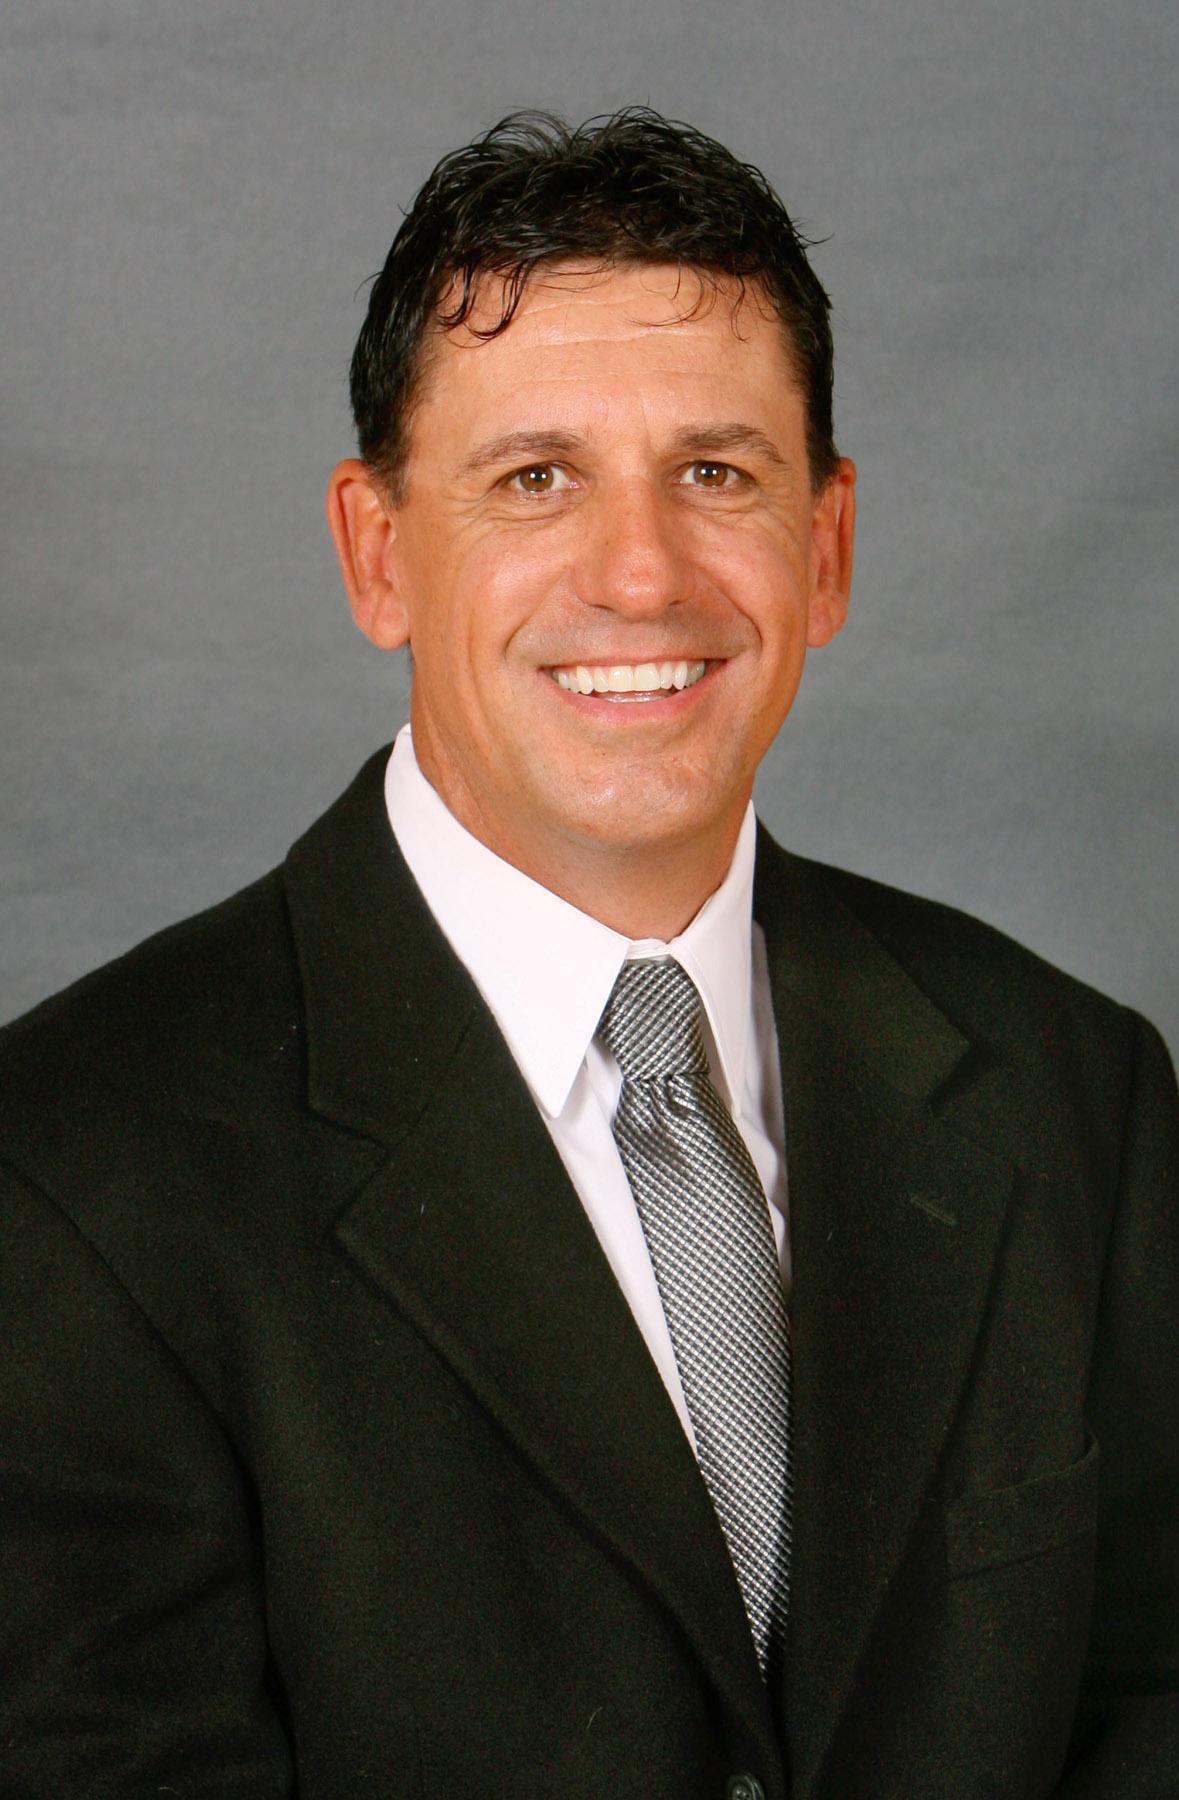 Rick Bertagnolli